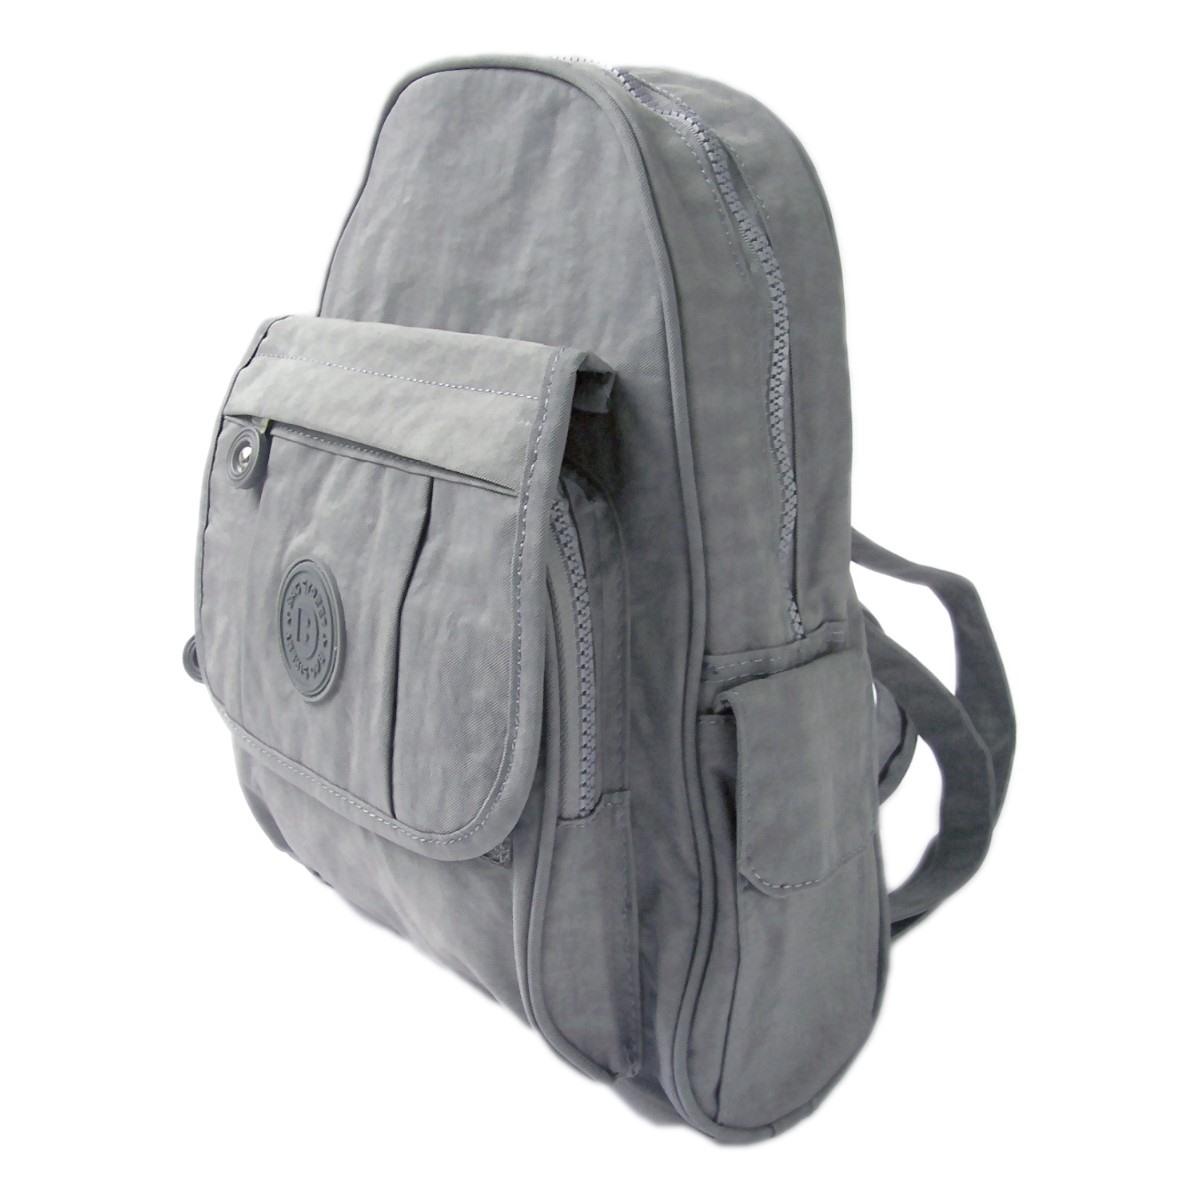 Damen City-Rucksack Freizeit Kinderrucksack Tasche grau Ru2854